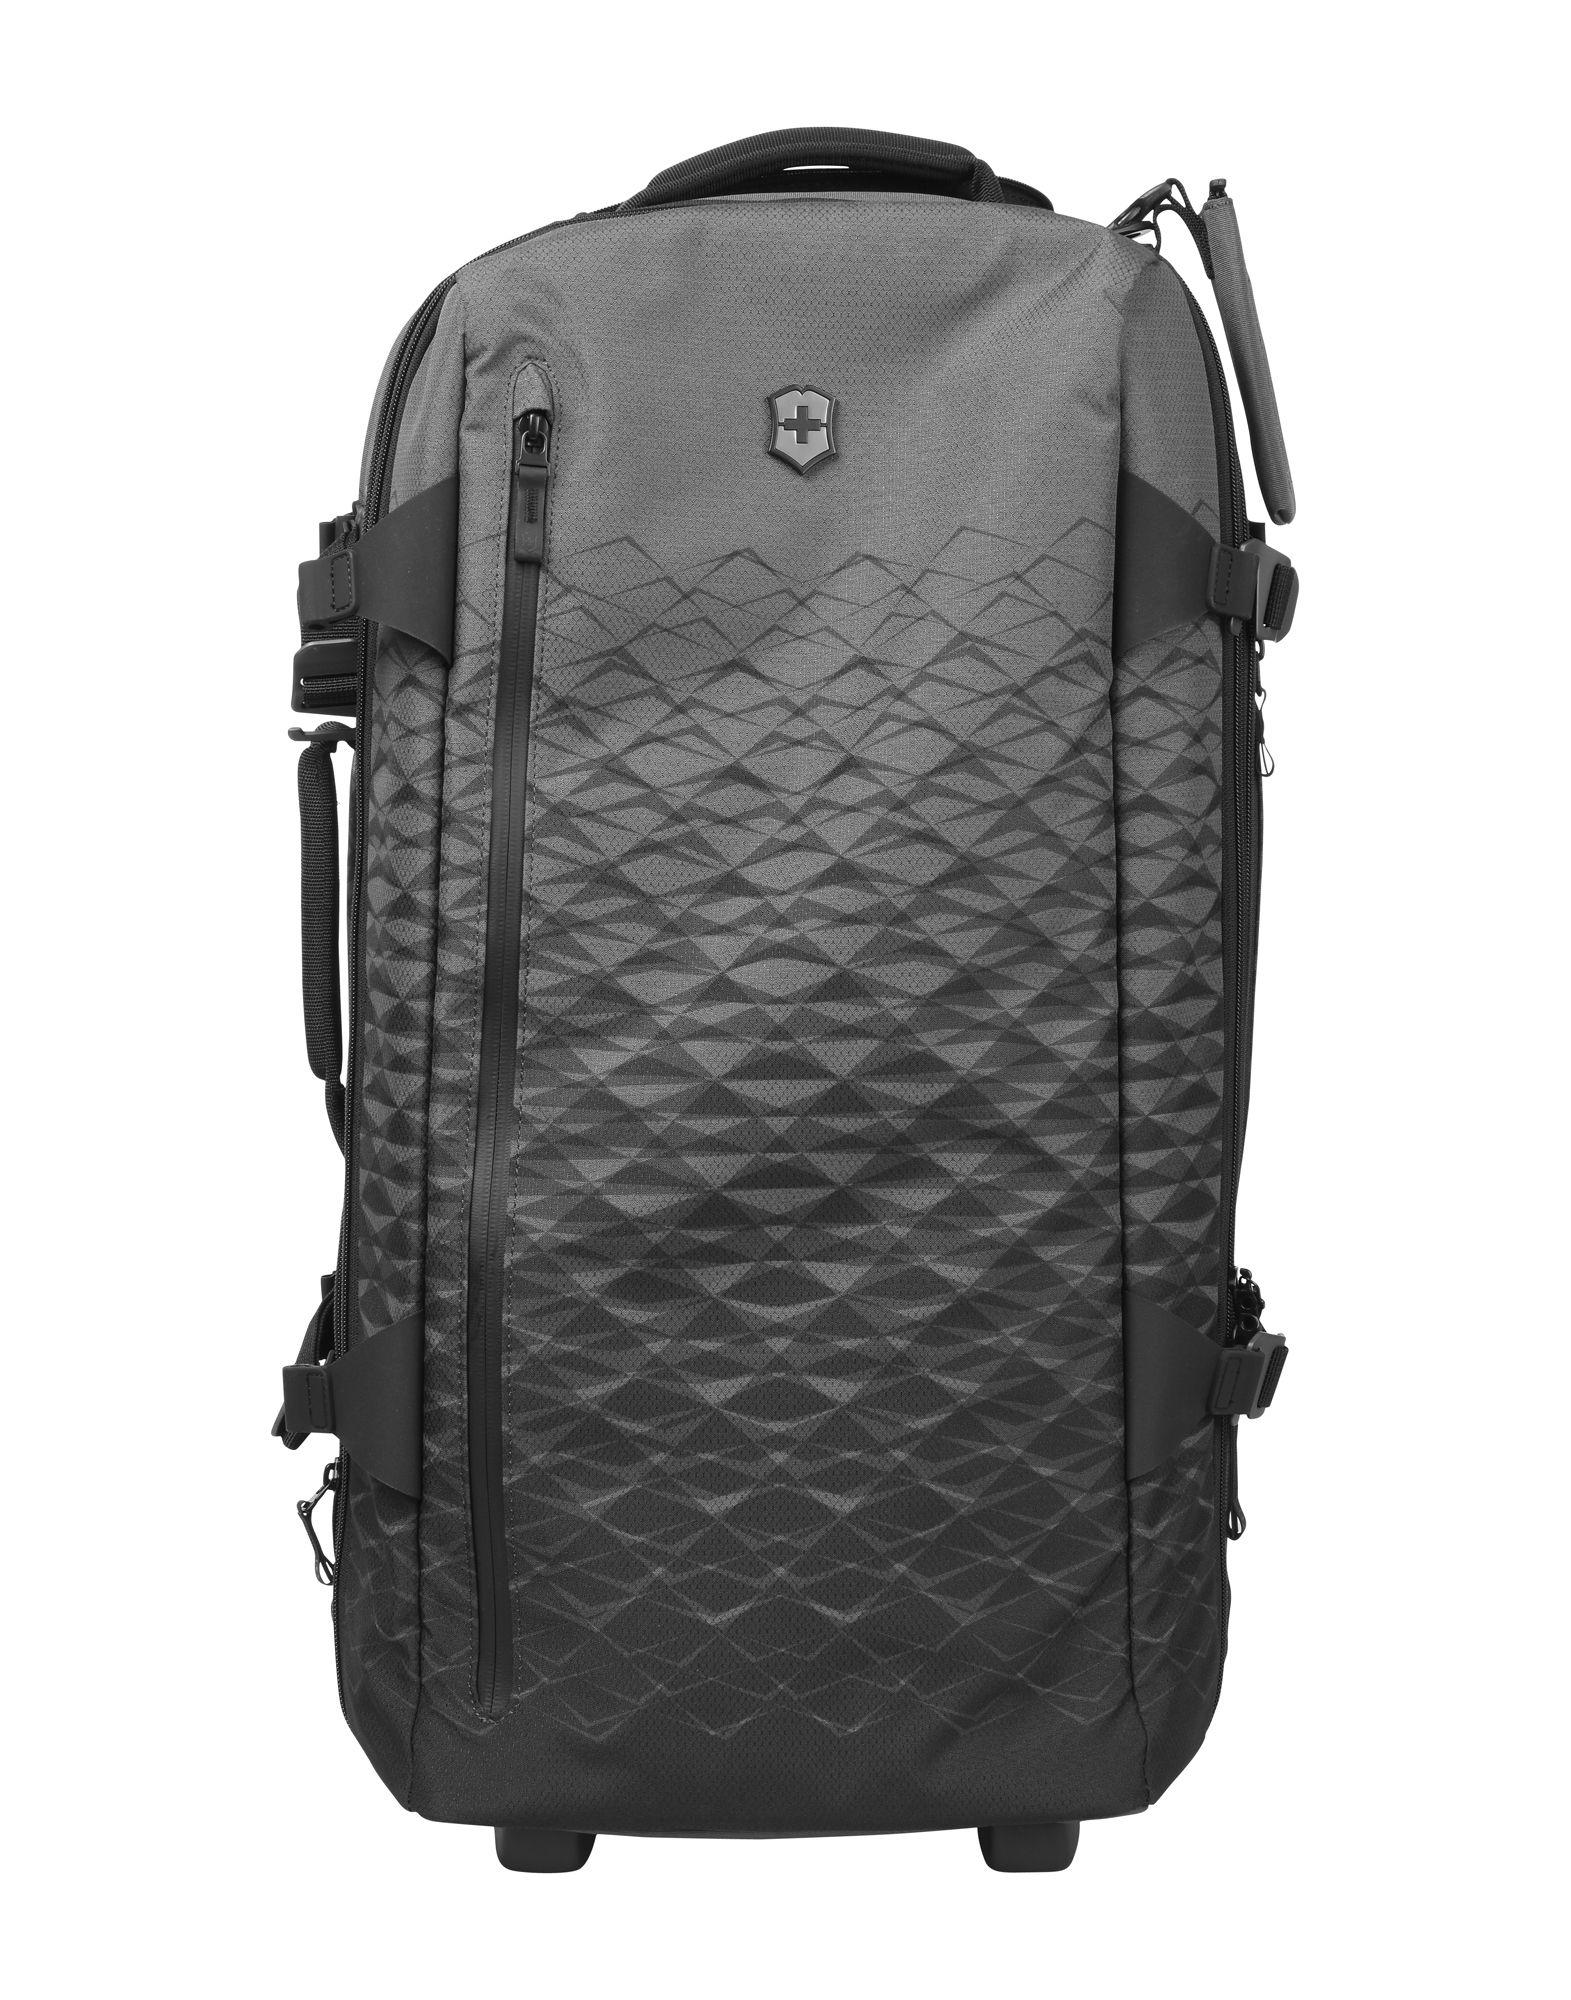 VICTORINOX Чемодан/сумка на колесиках чемодан samsonite чемодан 55 см base boost